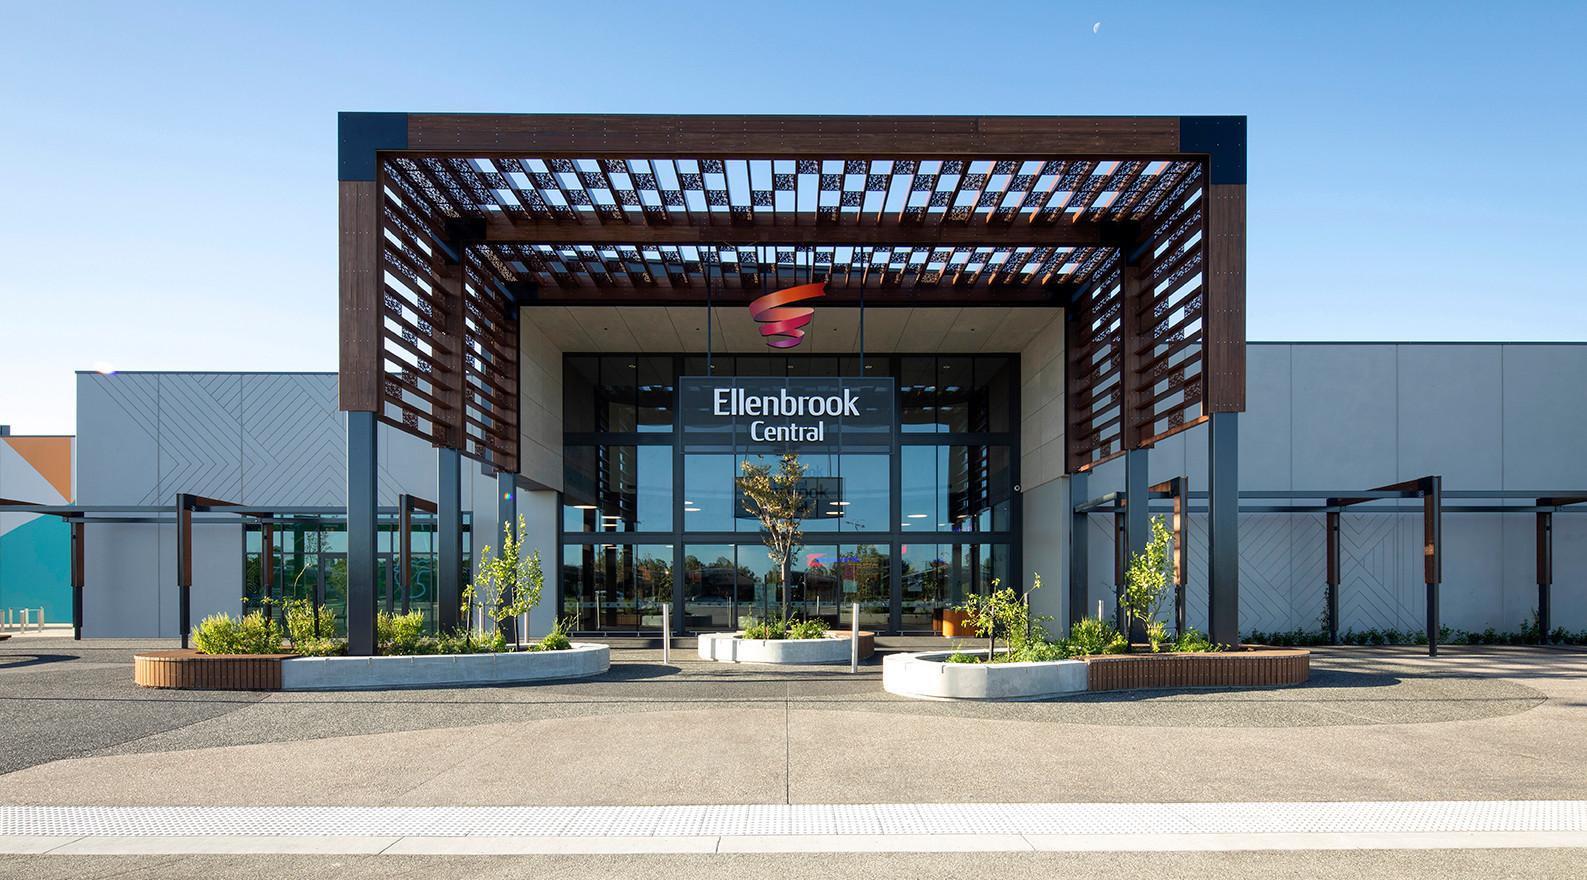 Ellenbrook Central Shopping Centre